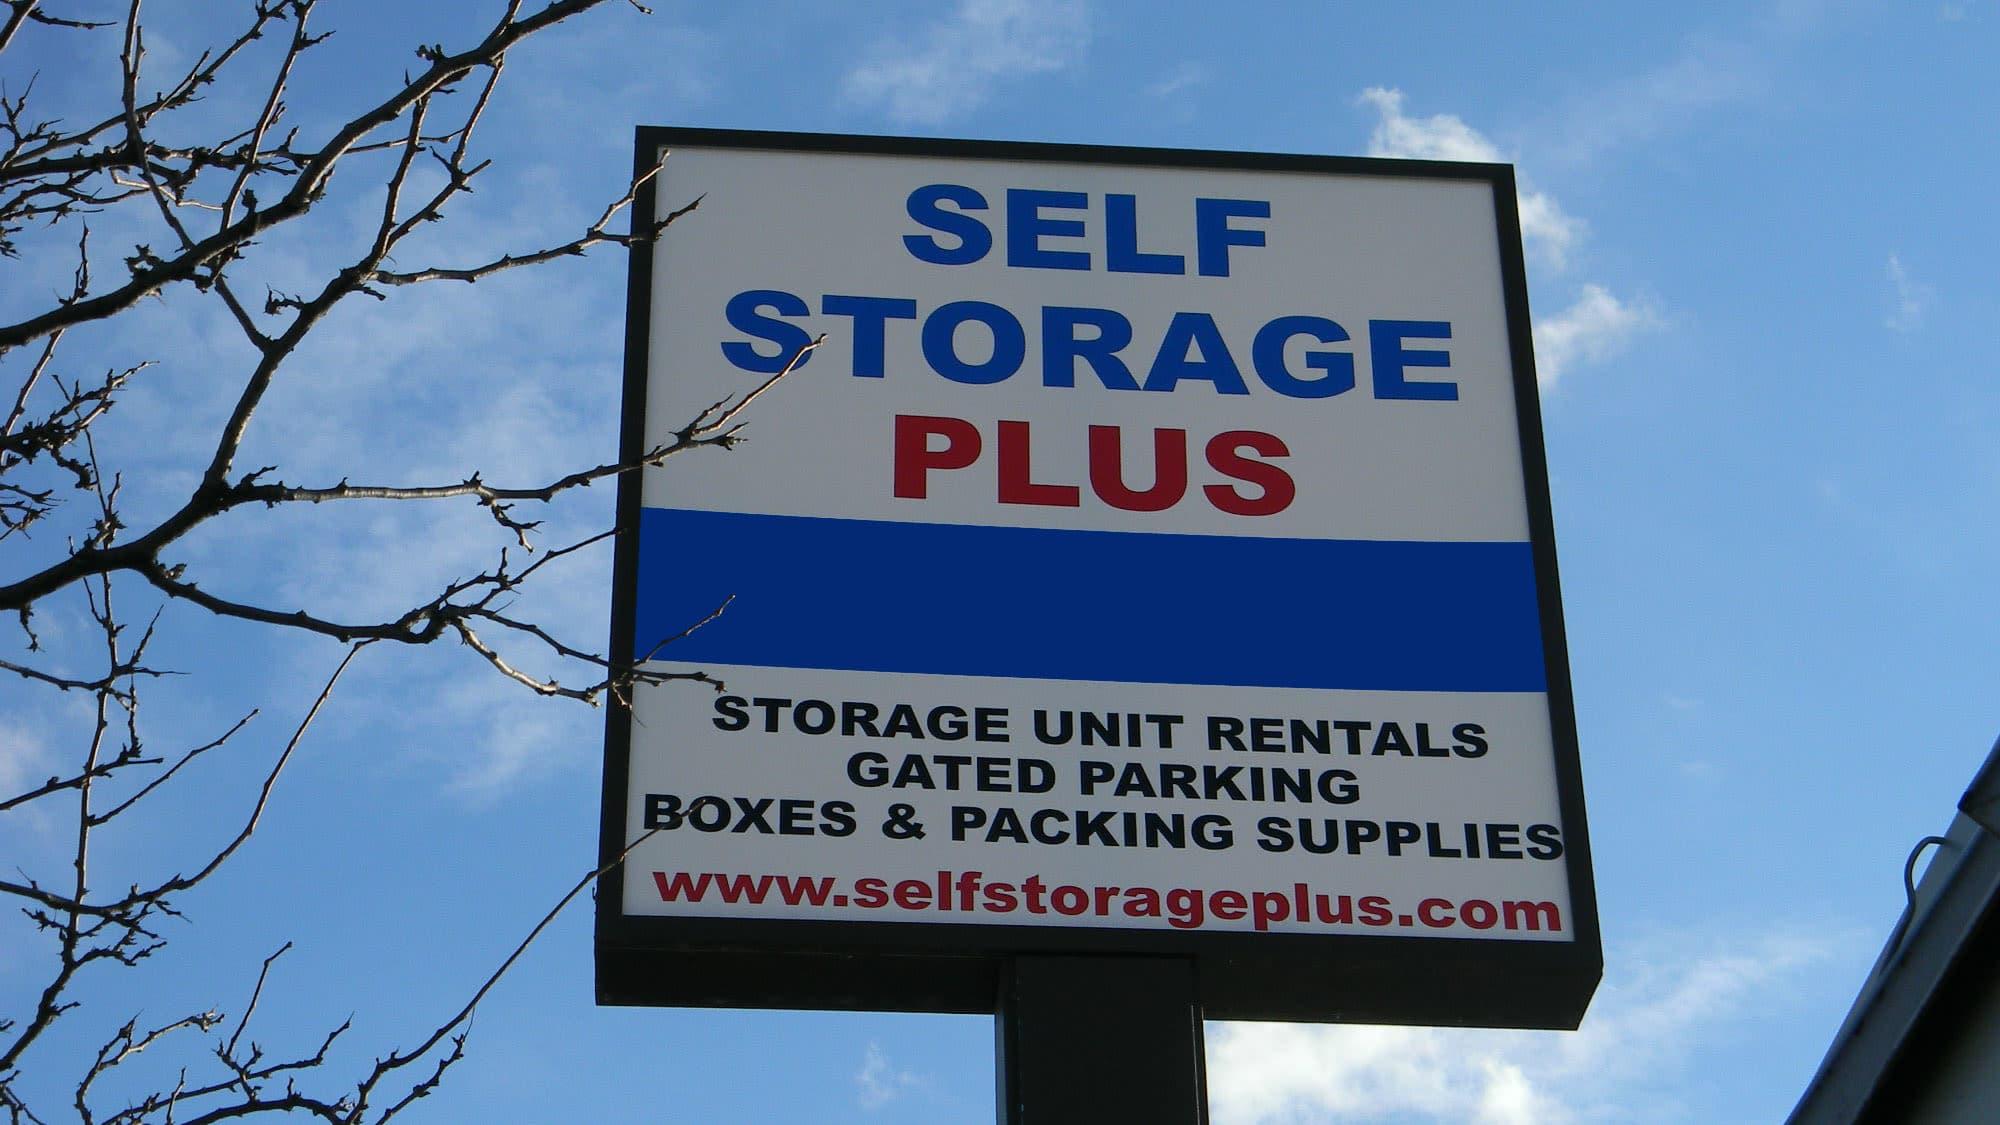 Welcome sign at Self Storage Plus in Alexandria, VA